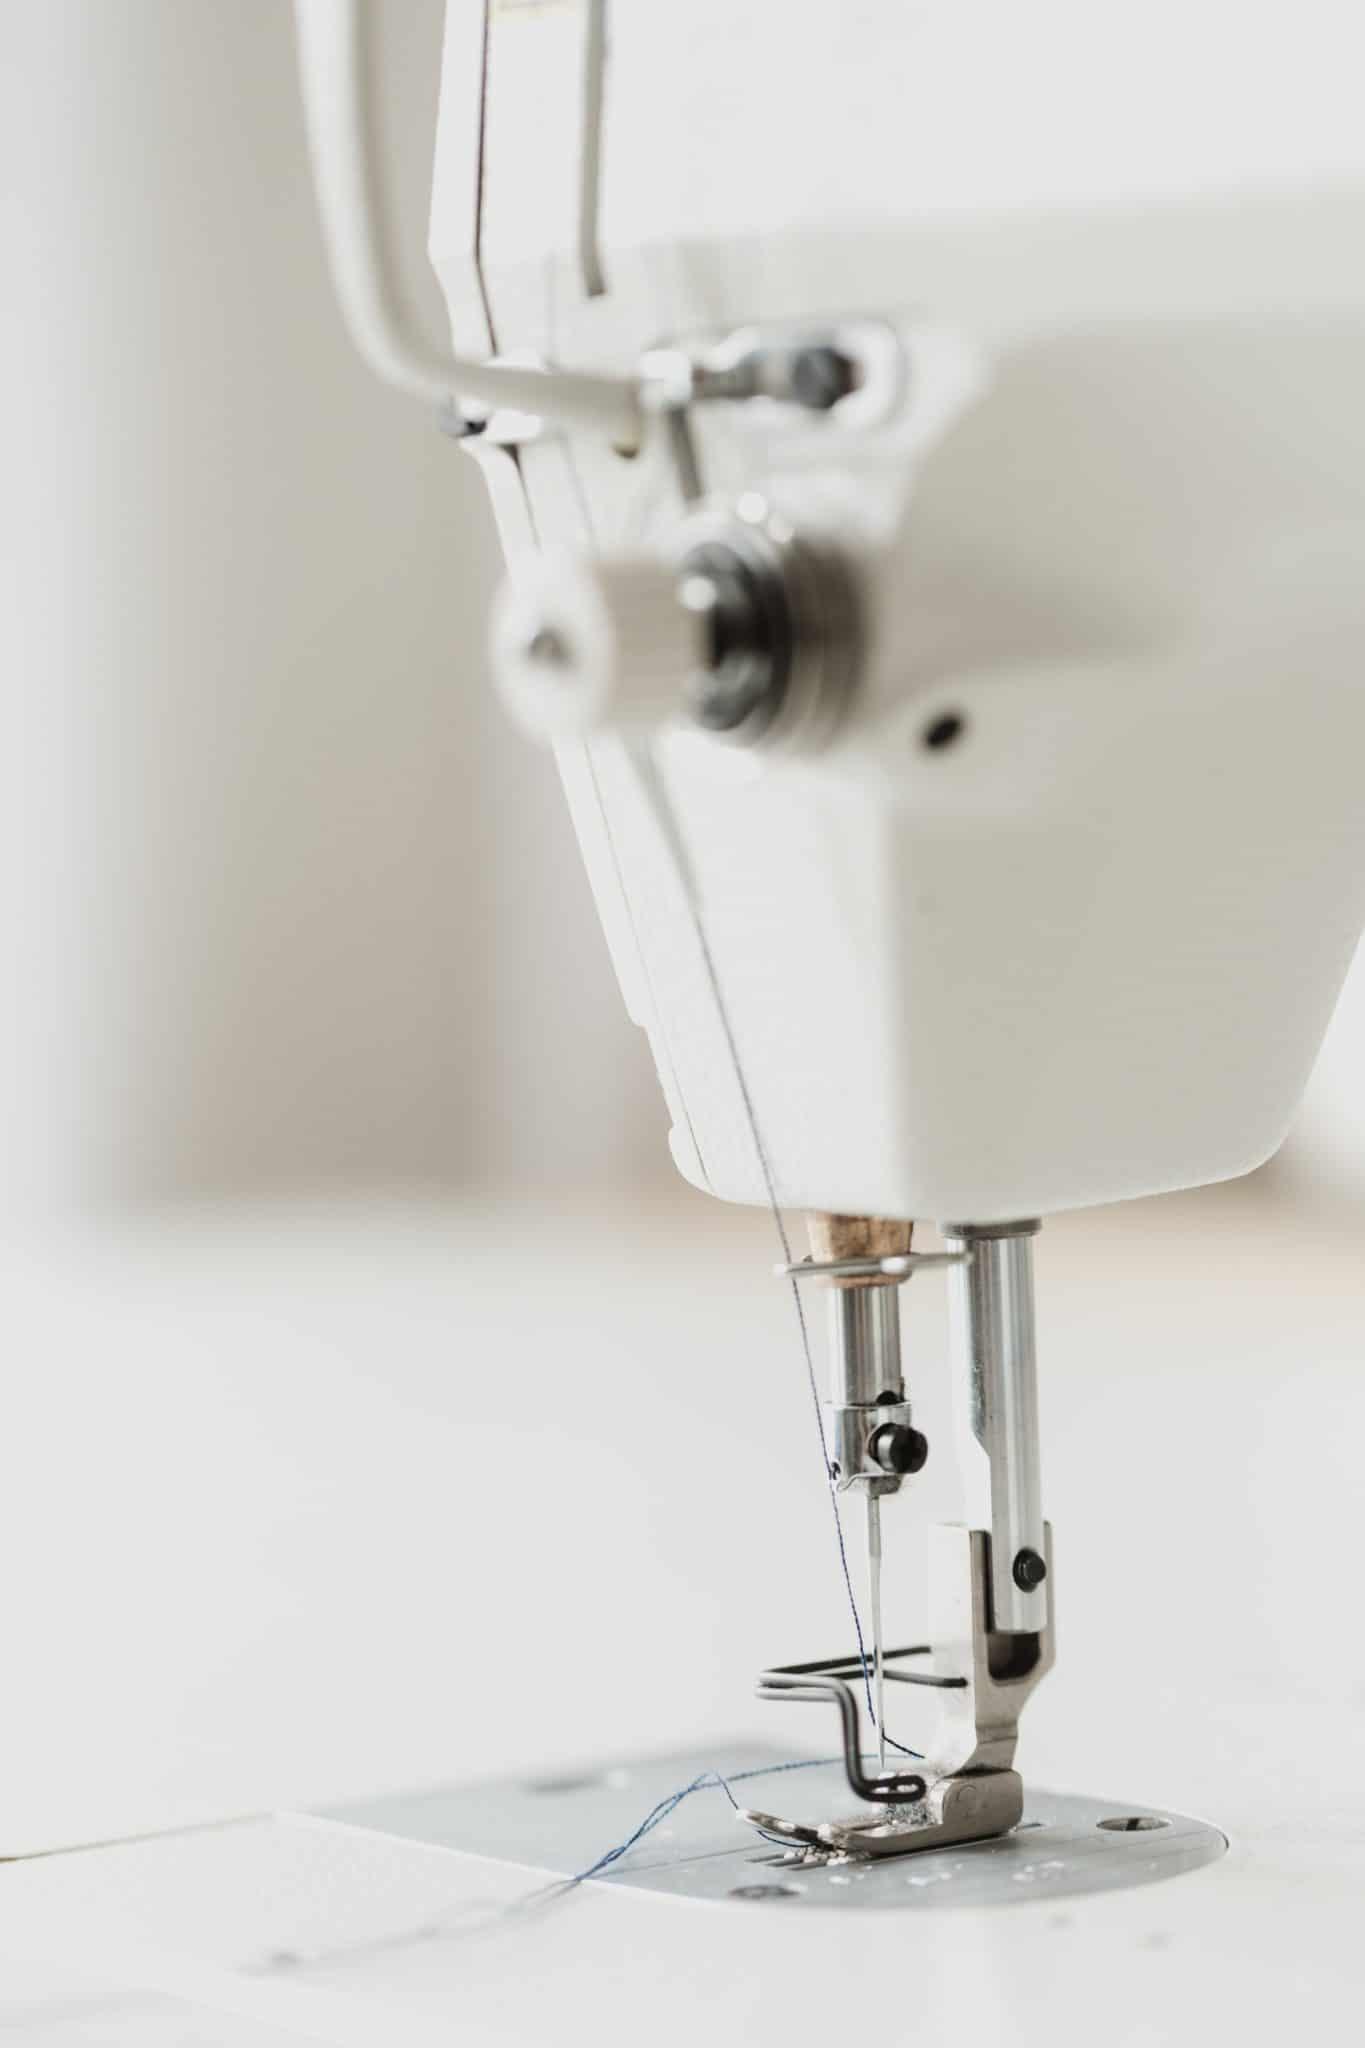 vertical-sewing-needle-closeup.jpg